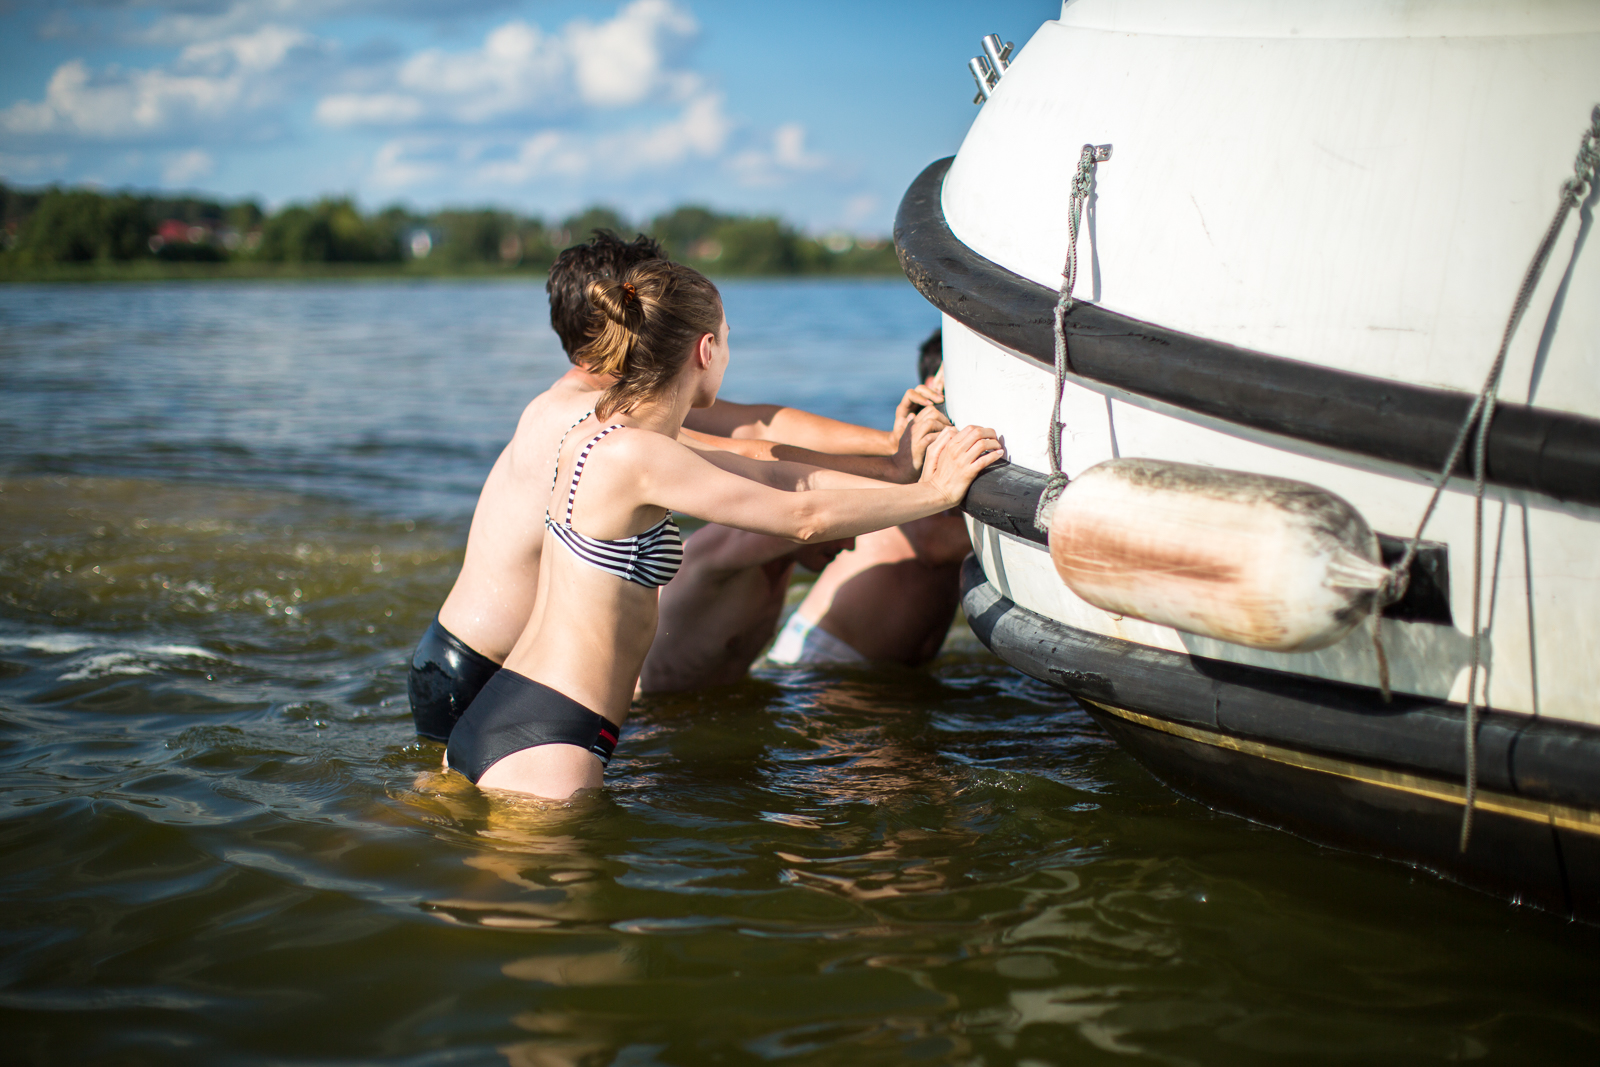 оттолкнуть лодку от берега